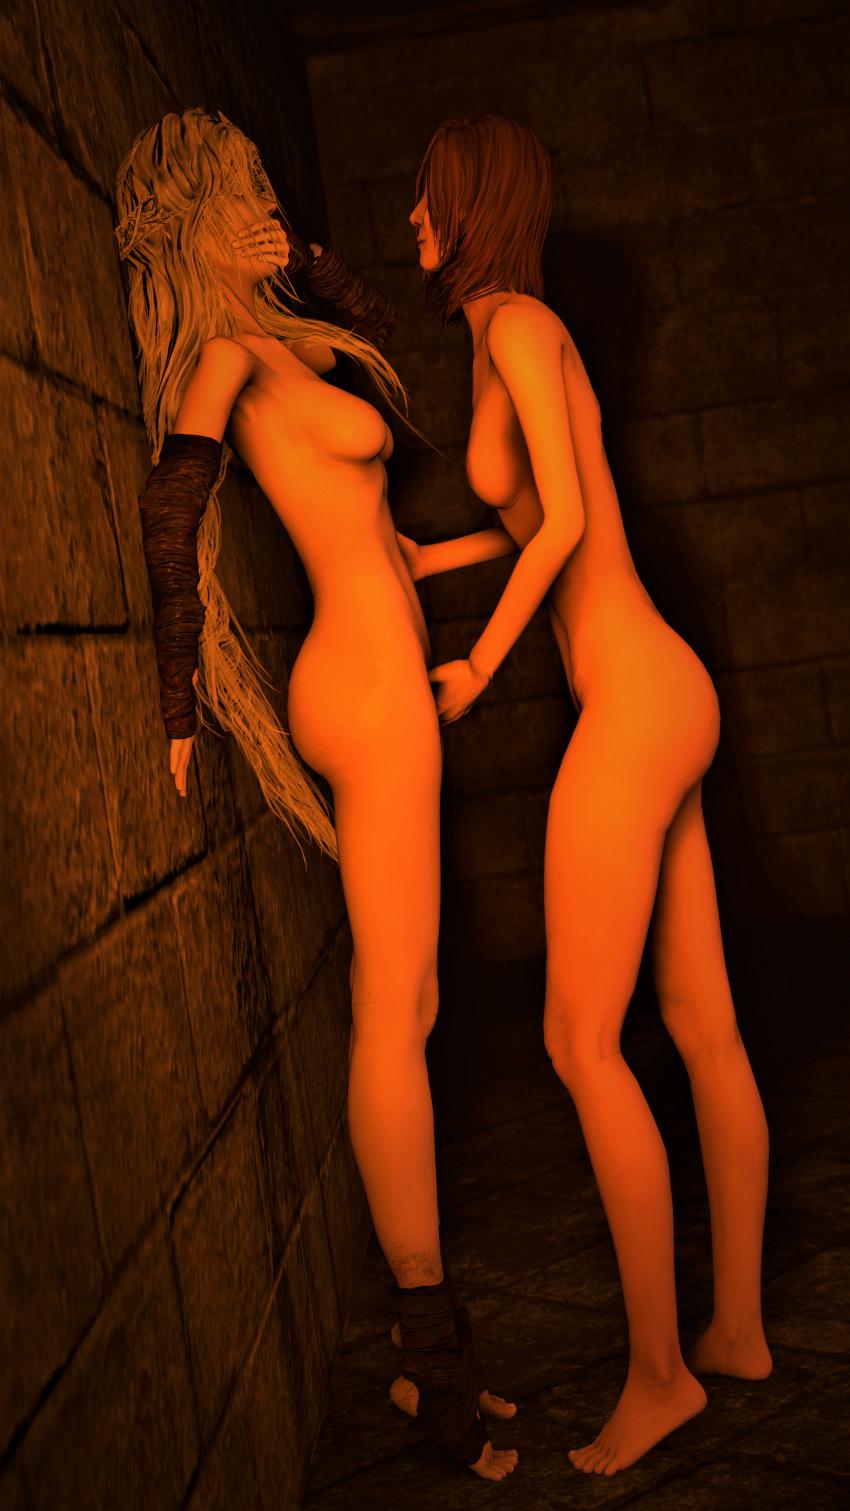 dark souls armor 3 dancers Sword art online 2 sinon naked